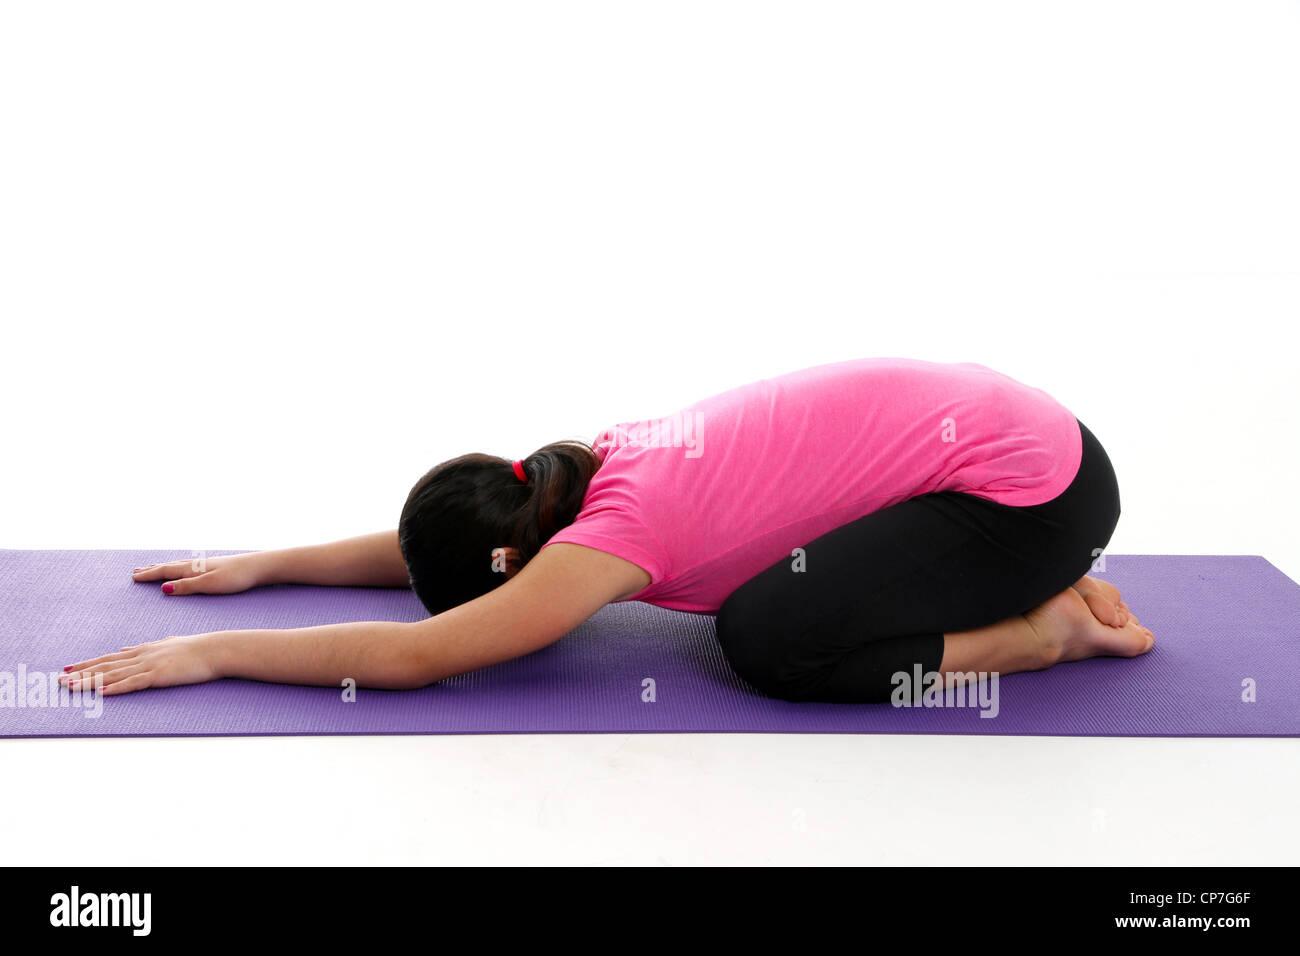 Girl Doing Yoga Pose in a Studio - Stock Image